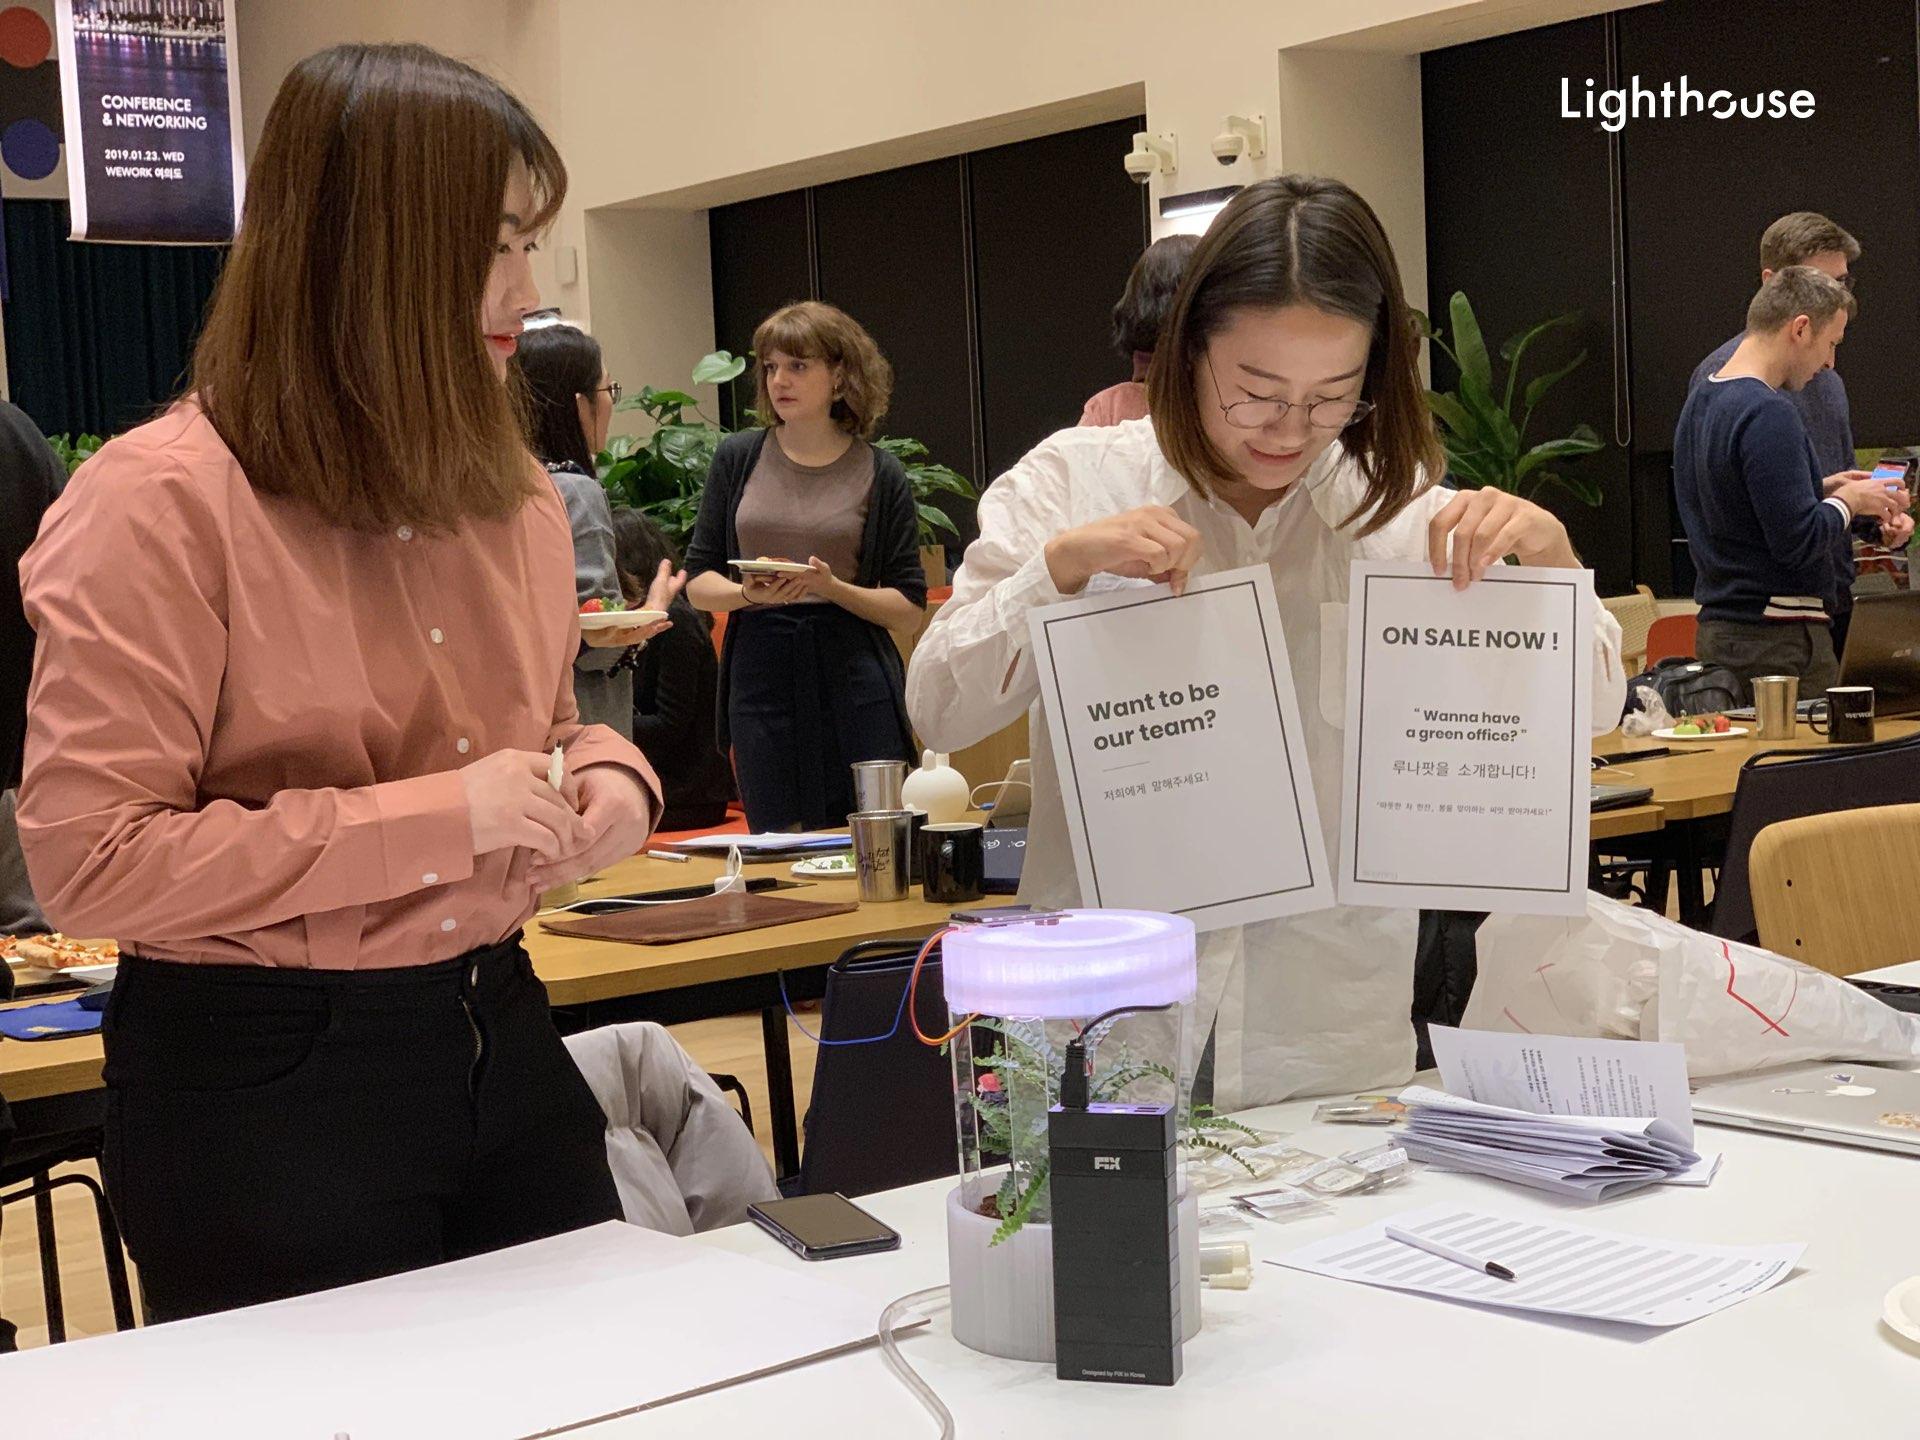 Lighthouse Workshops Photos_Lighting Up Ventures Inc.021.jpeg